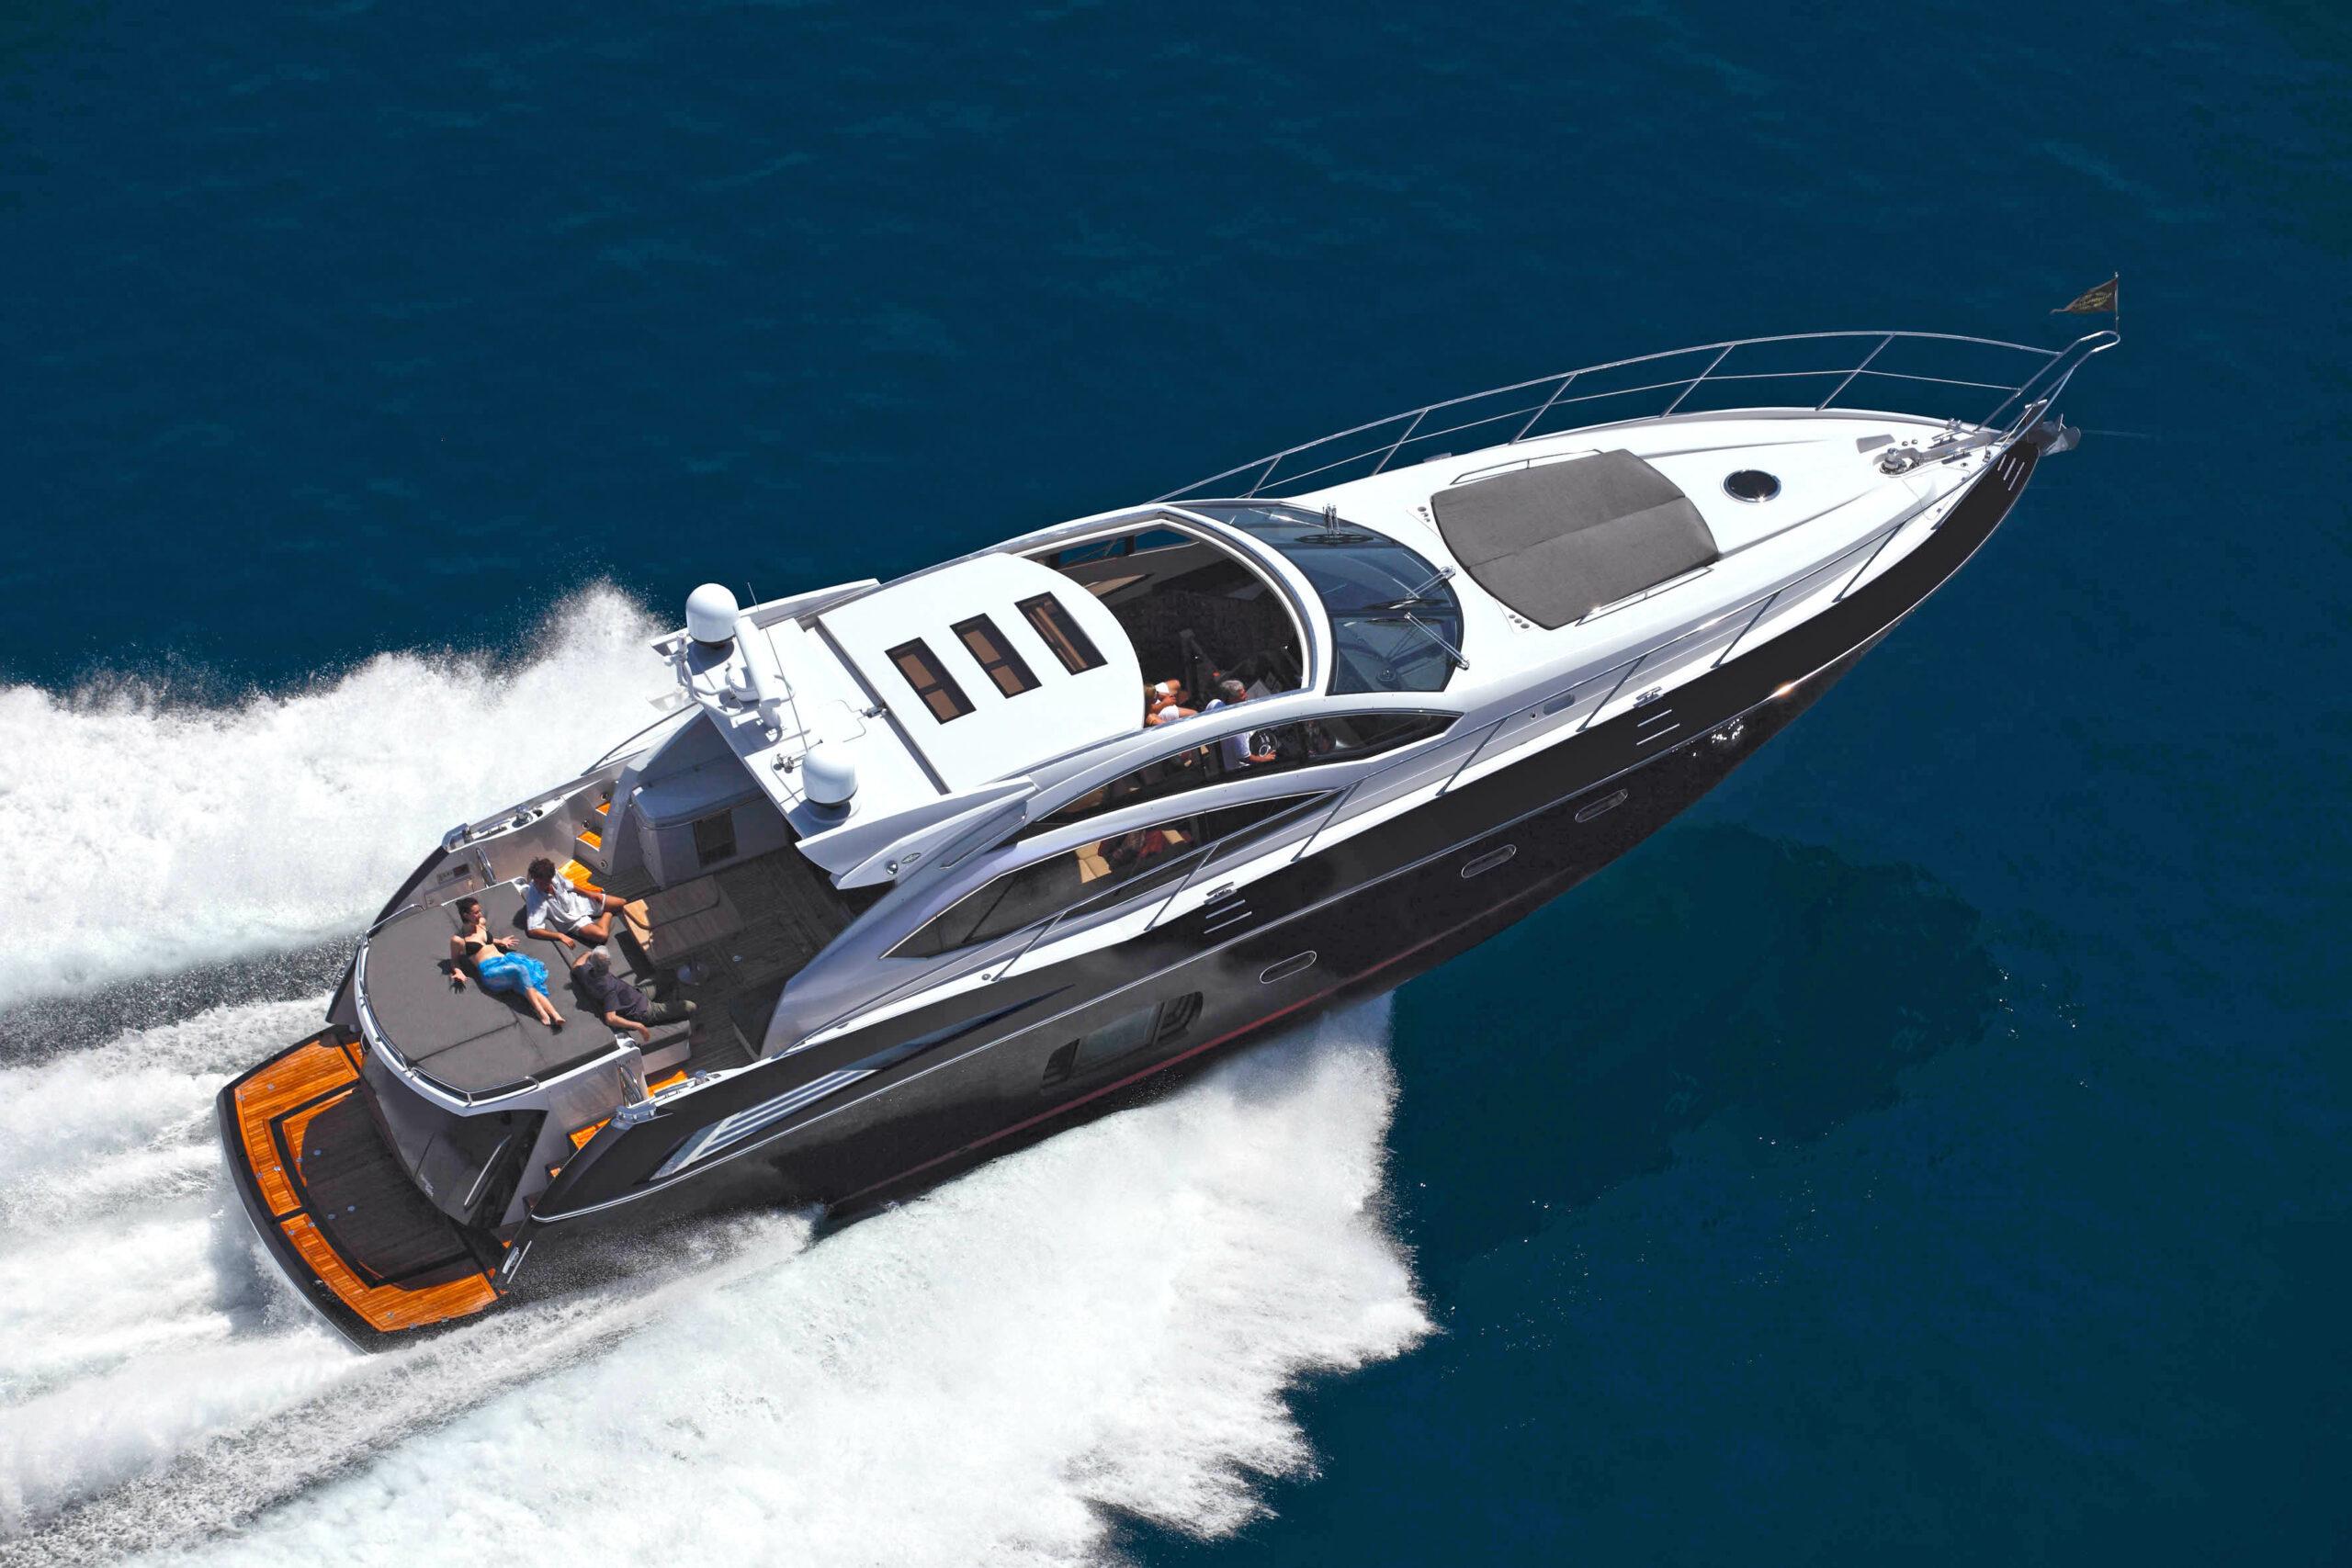 Sunseeker Predator 64 'Black Pearl' - Sieckmann Yachts